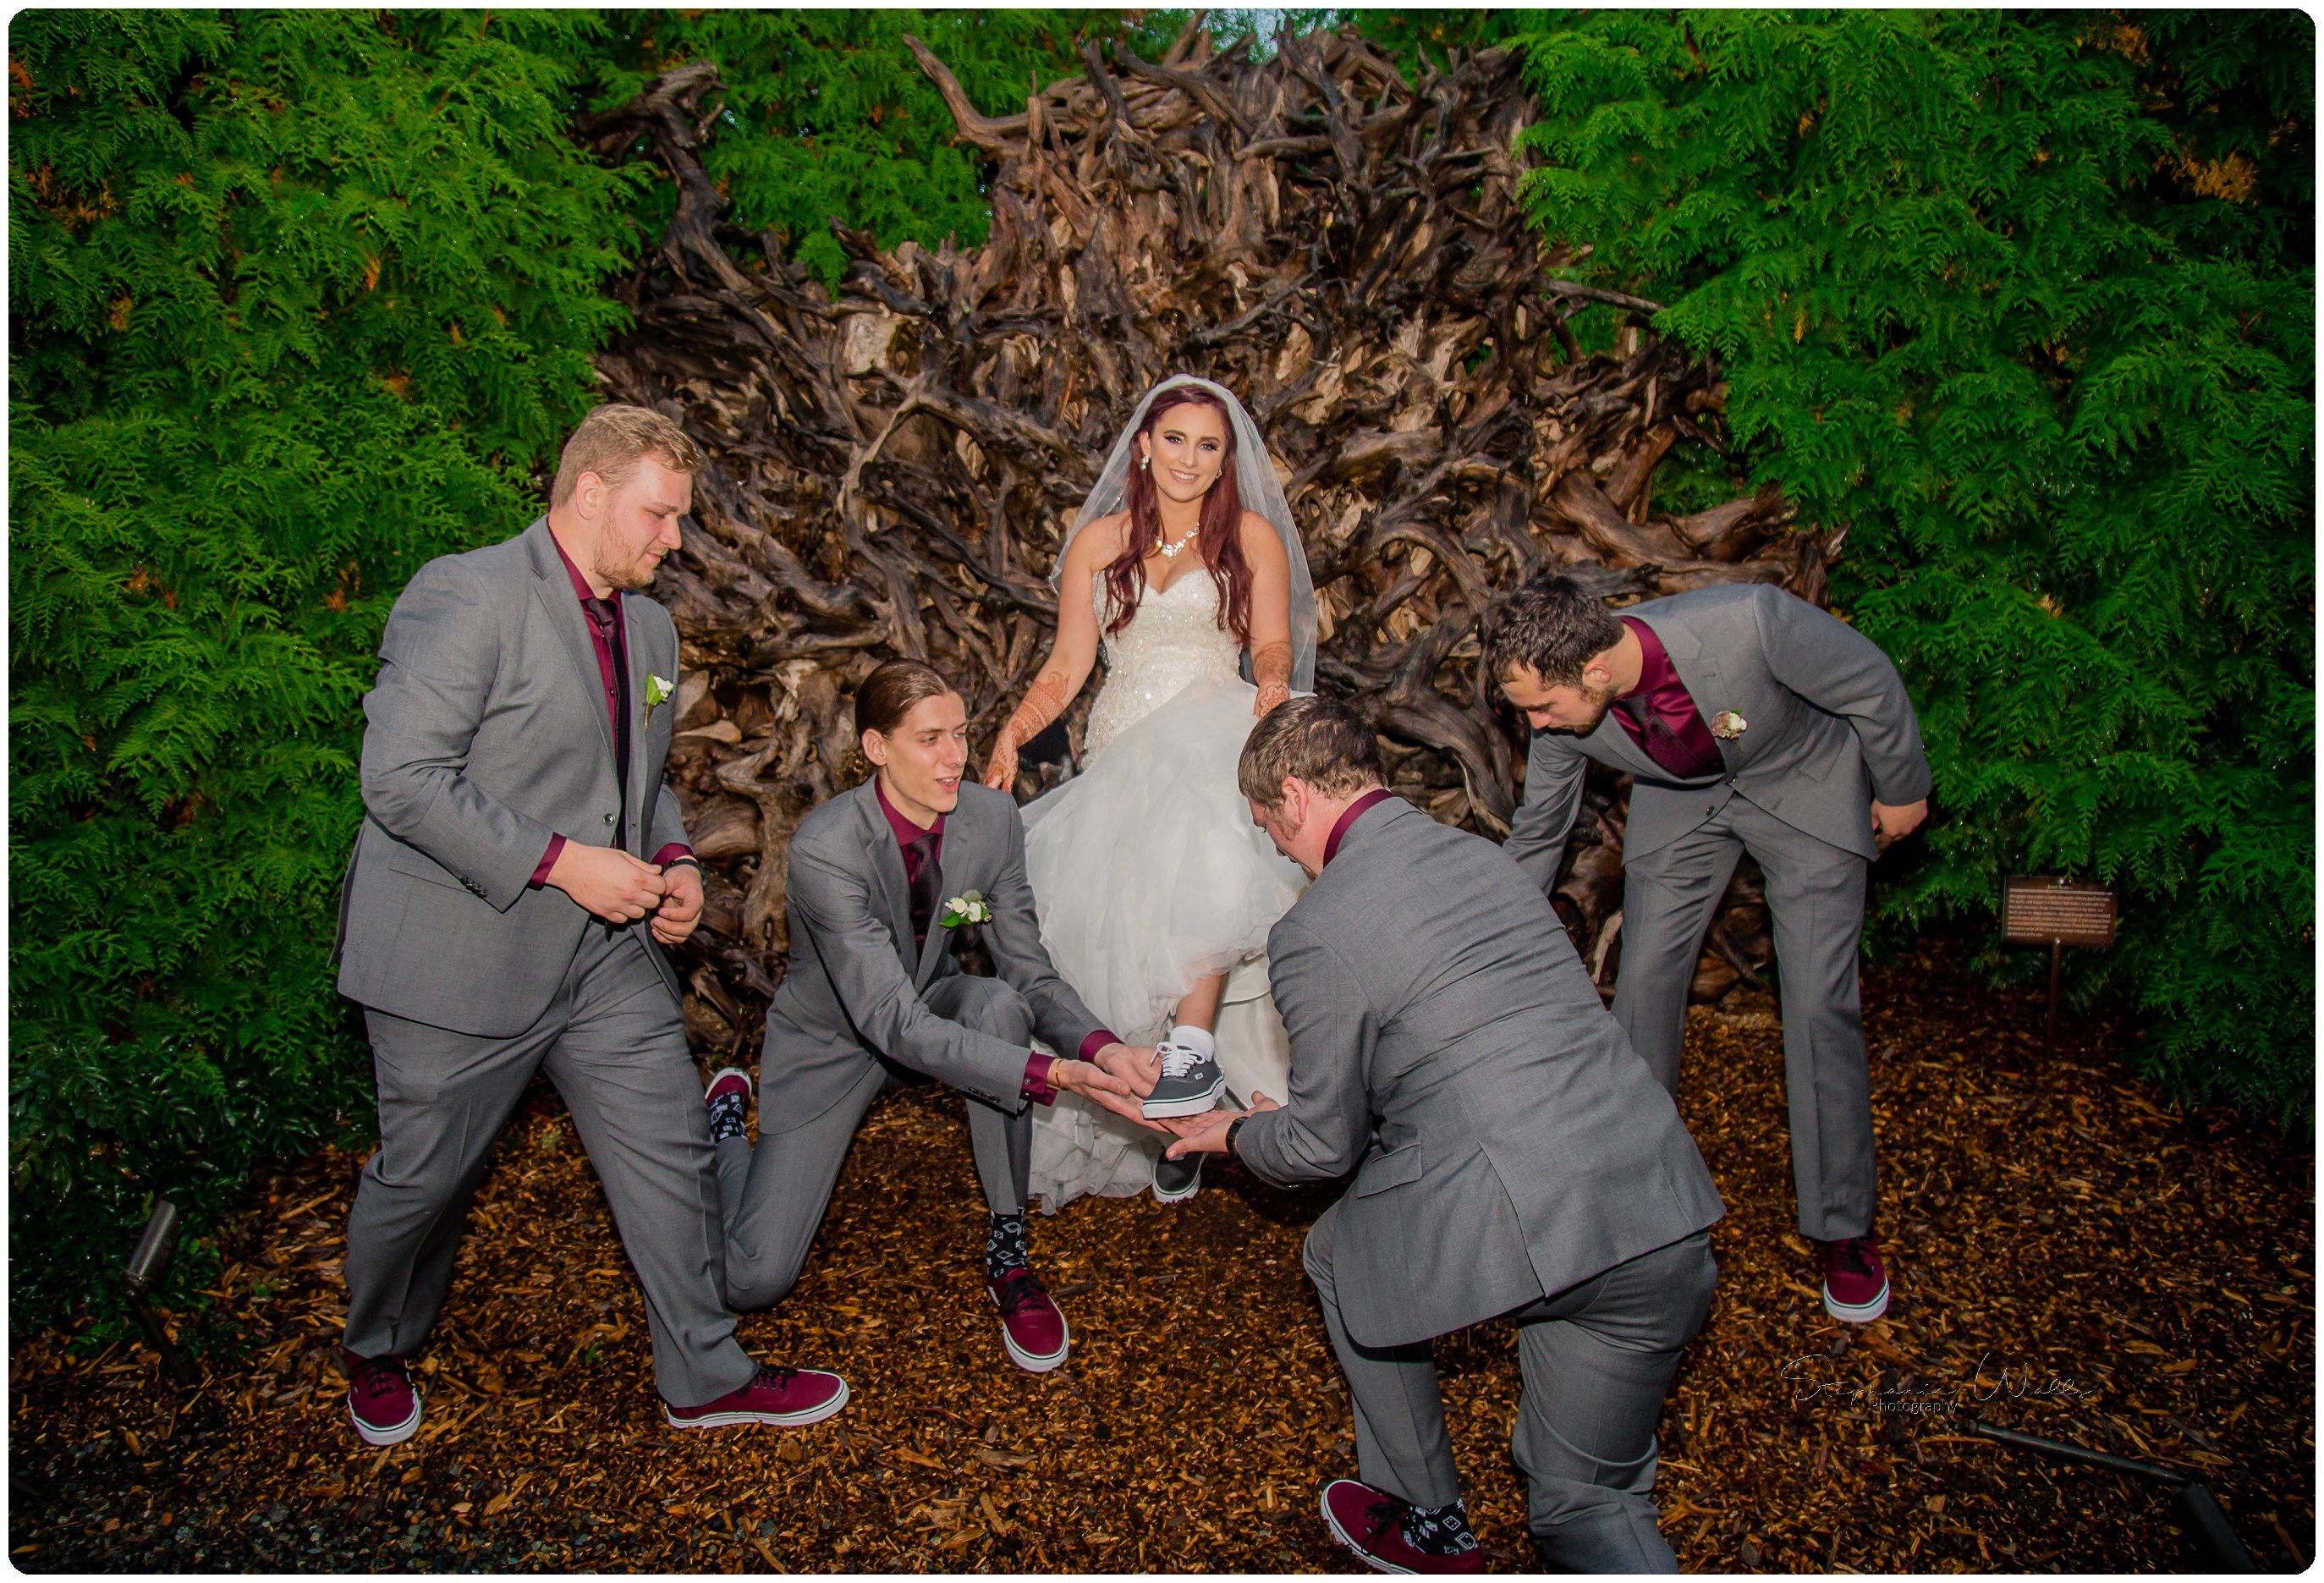 Wedding Party 014 Megan & Mo's Day 2   Willow Lodge Wedding   Woodinville, Wa Wedding Photographer